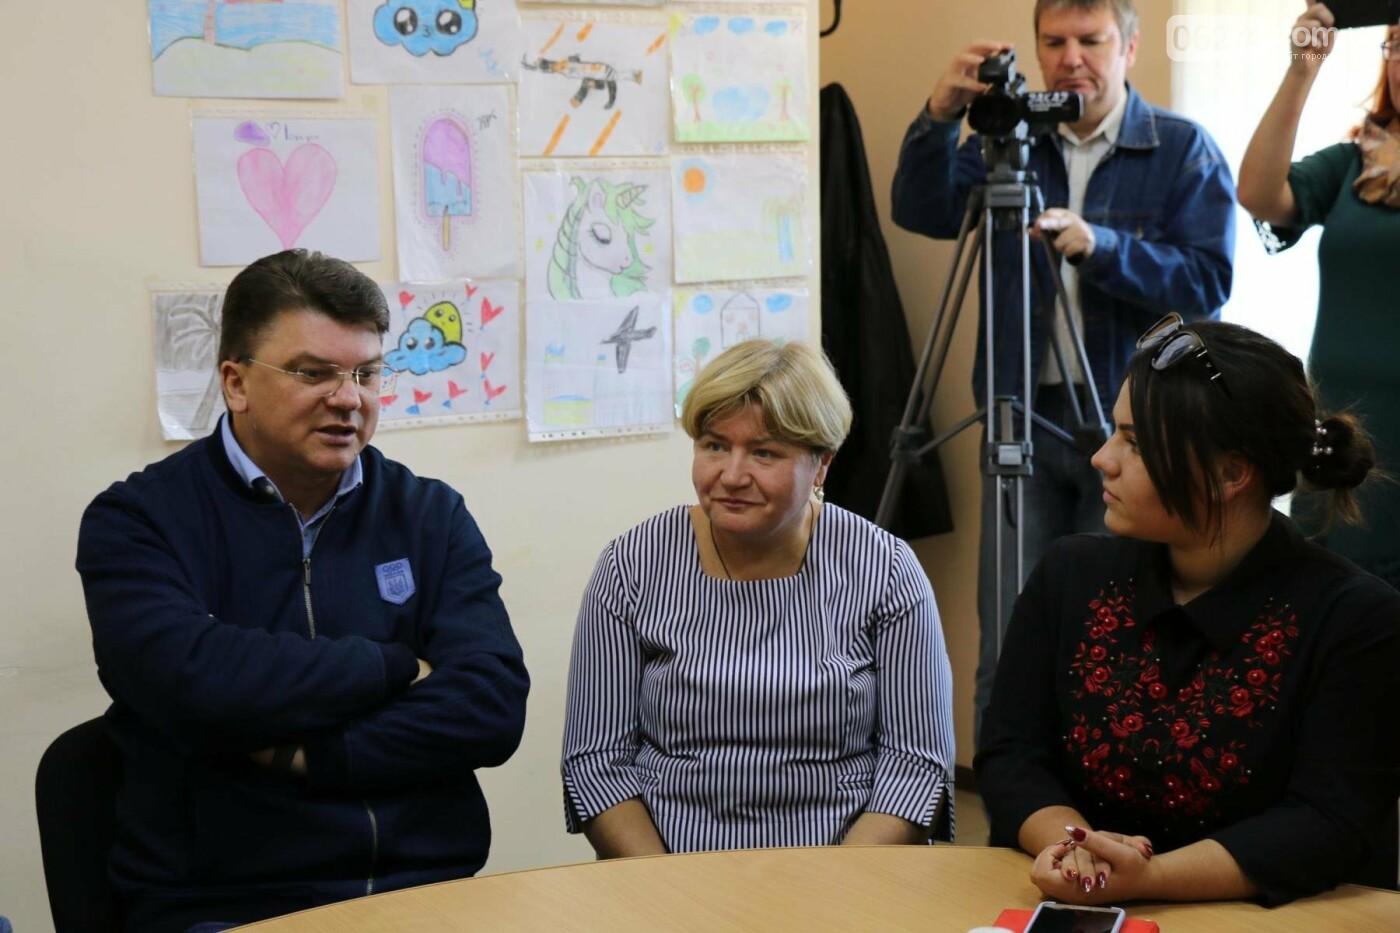 Бахмут посетил министр молодежи и спорта Украины, фото-7